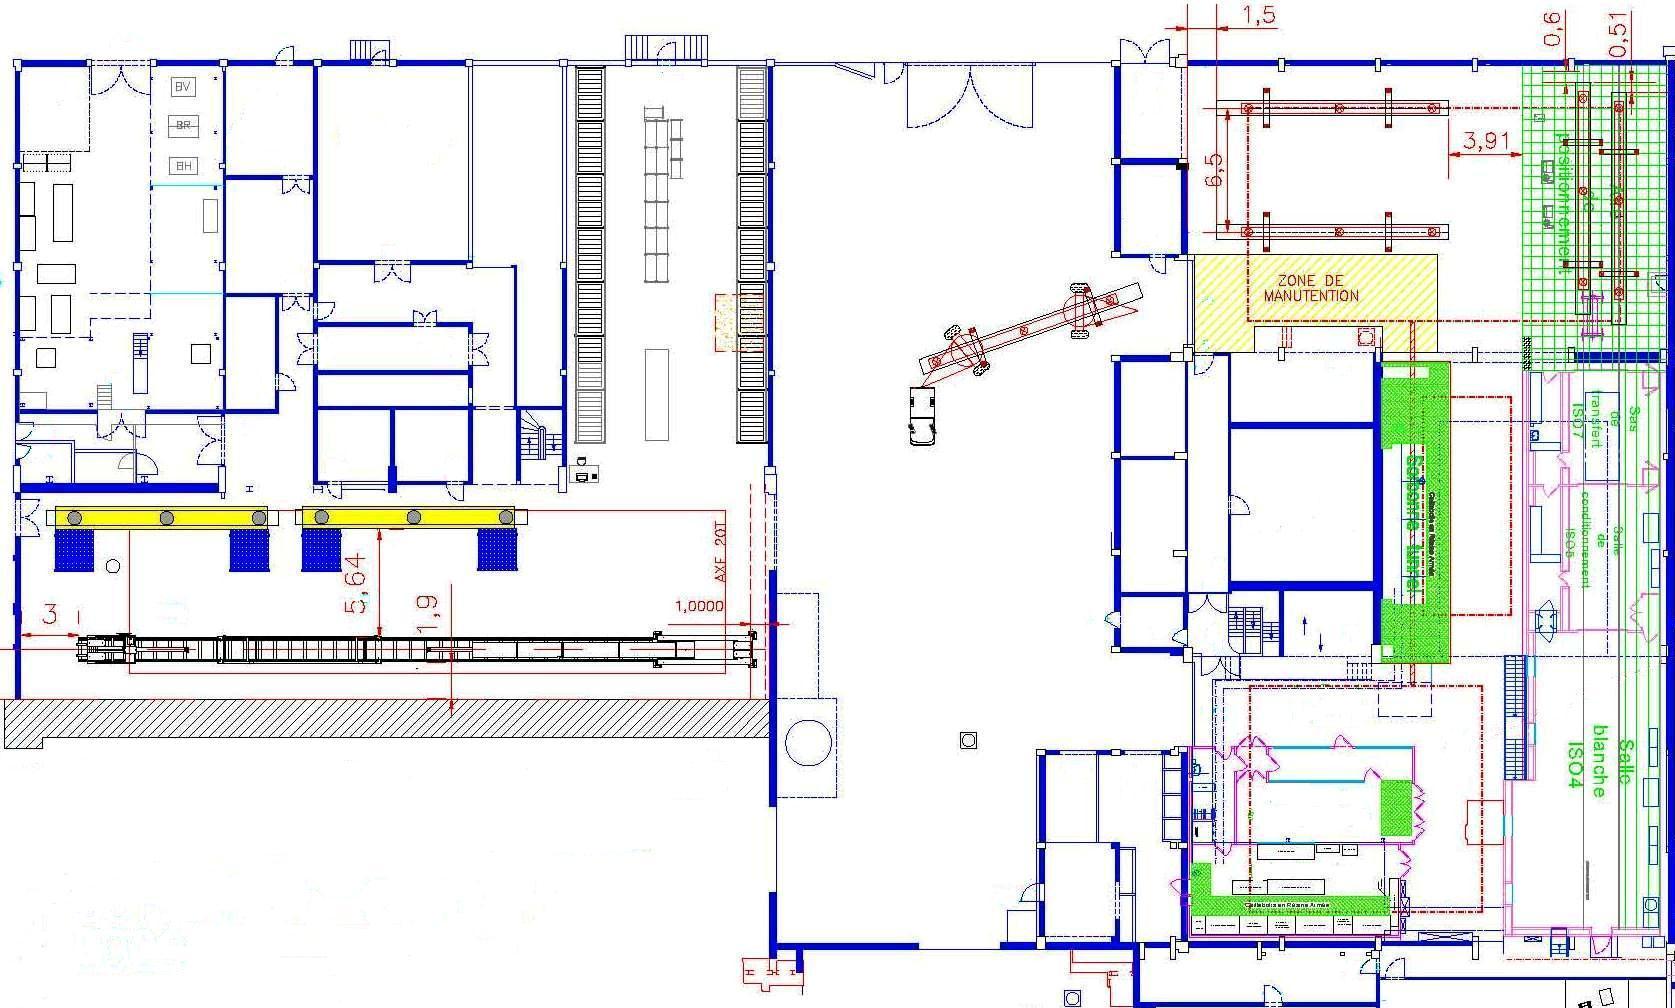 La source de lumi re xfel for Clean room design qualification